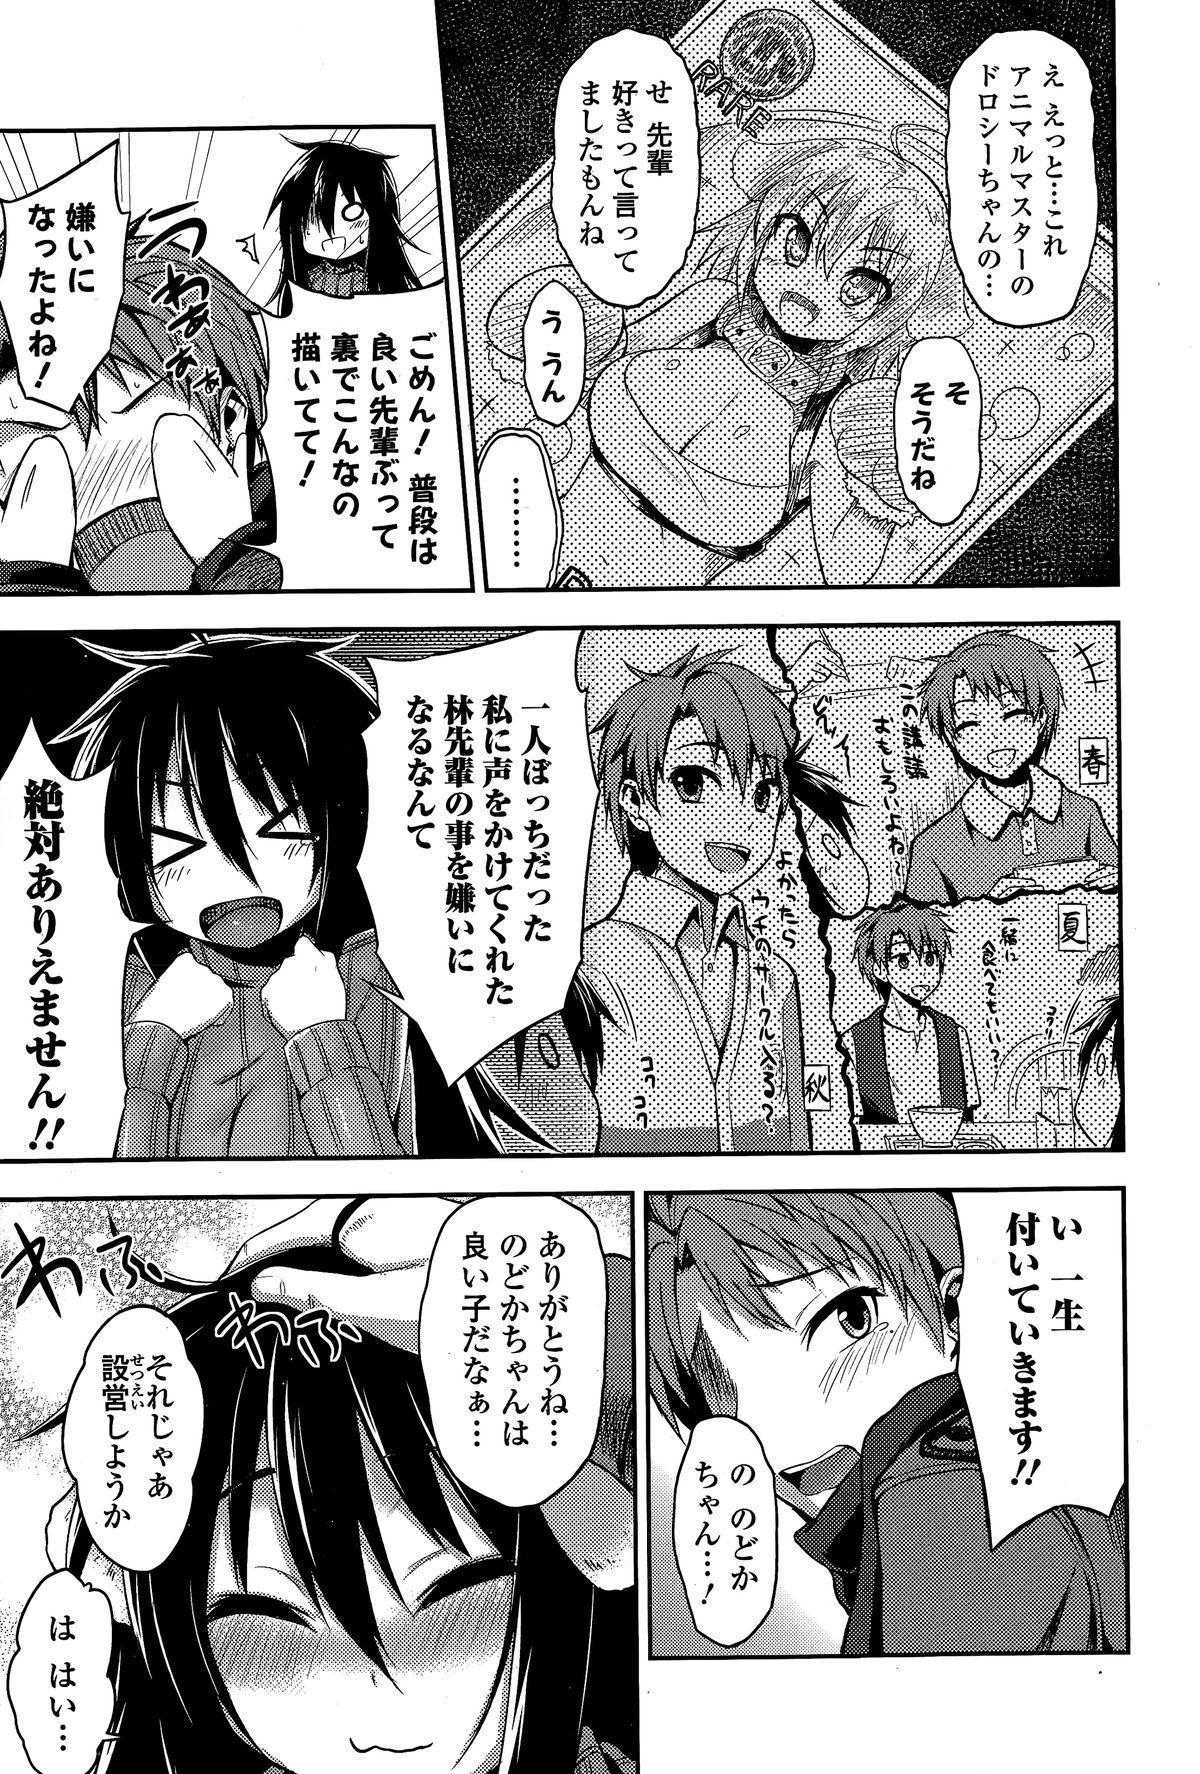 Comic Toutetsu 2015-02 Vol. 3 64